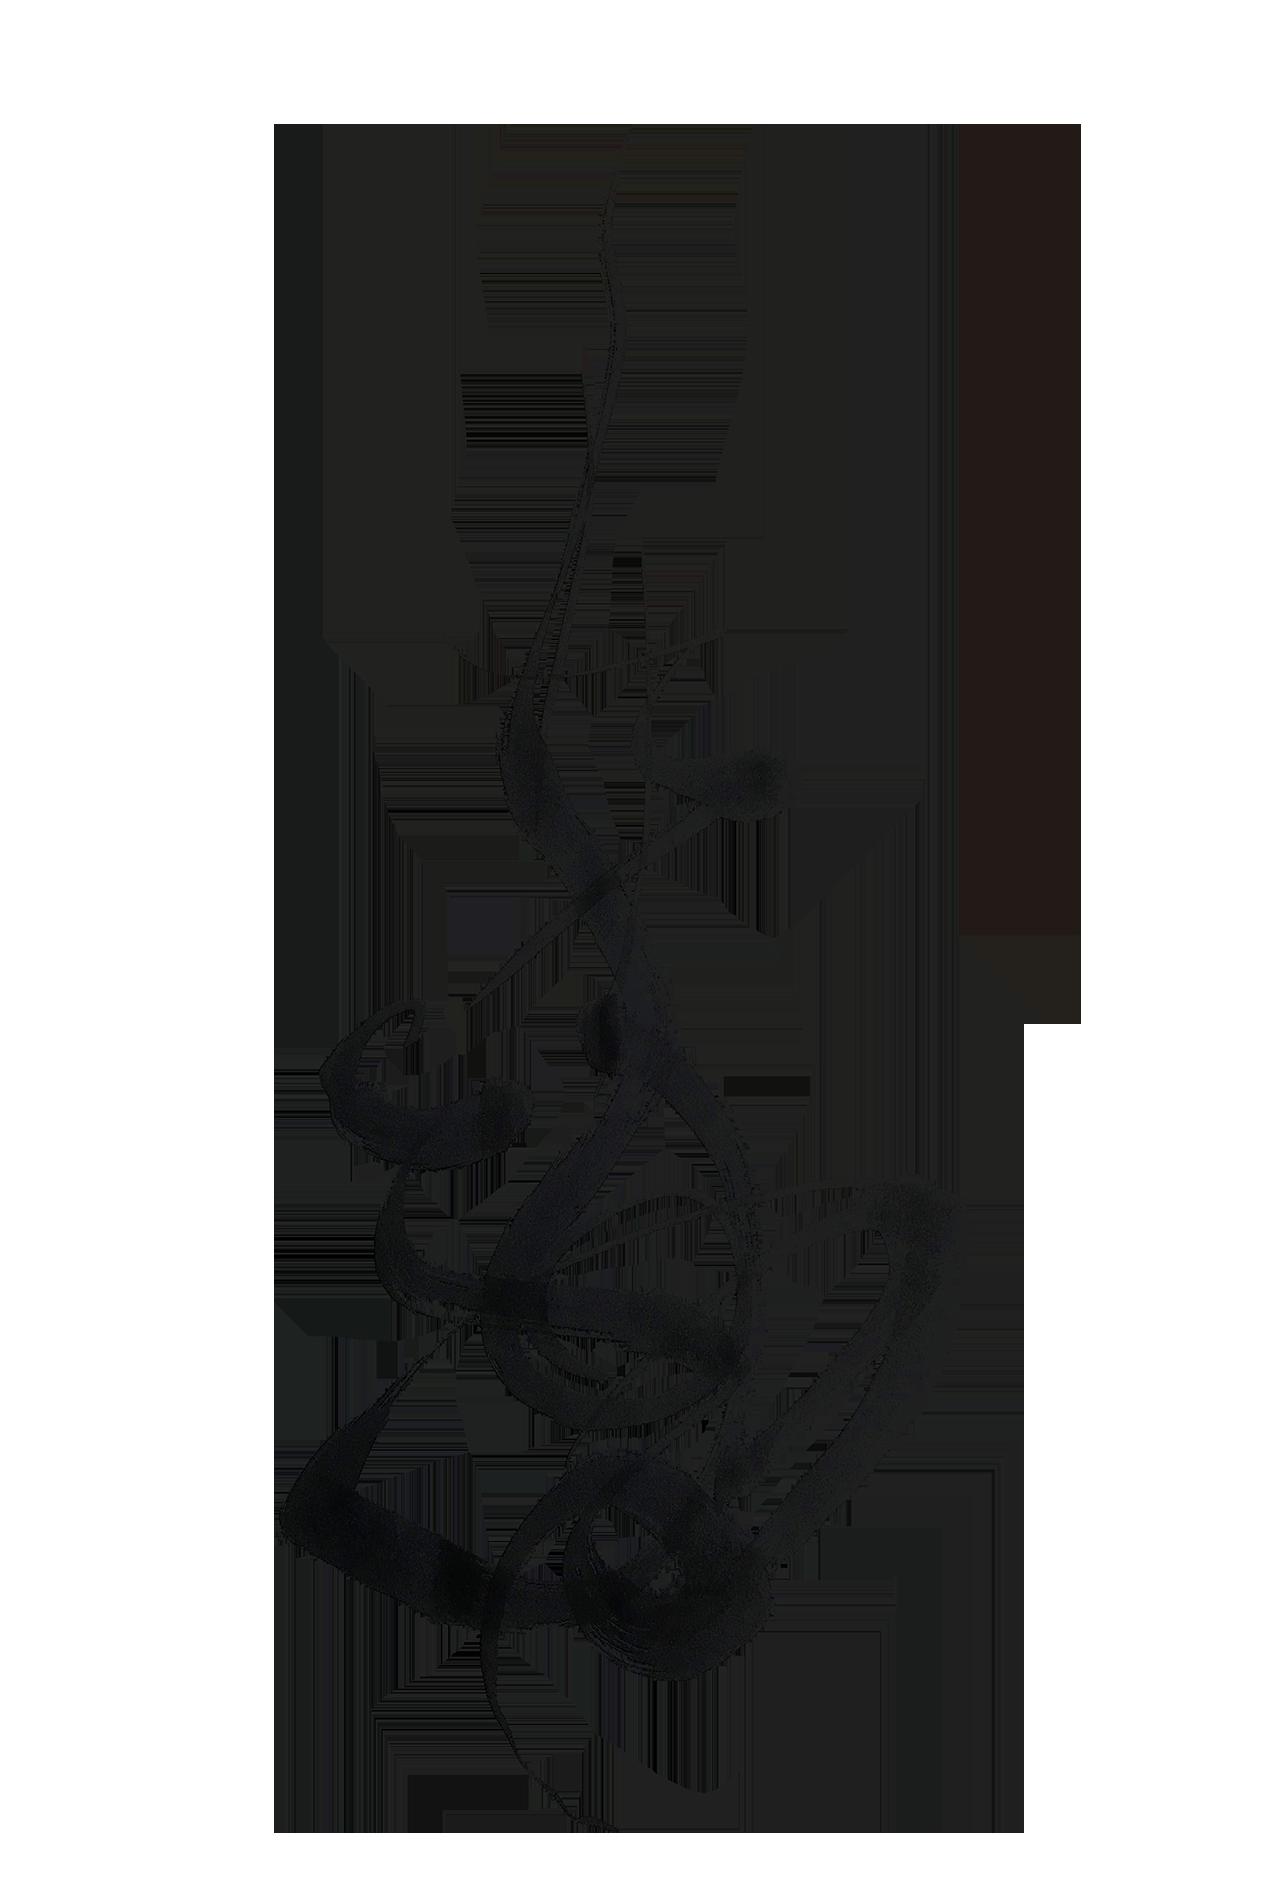 Calligraphy tarookamoto